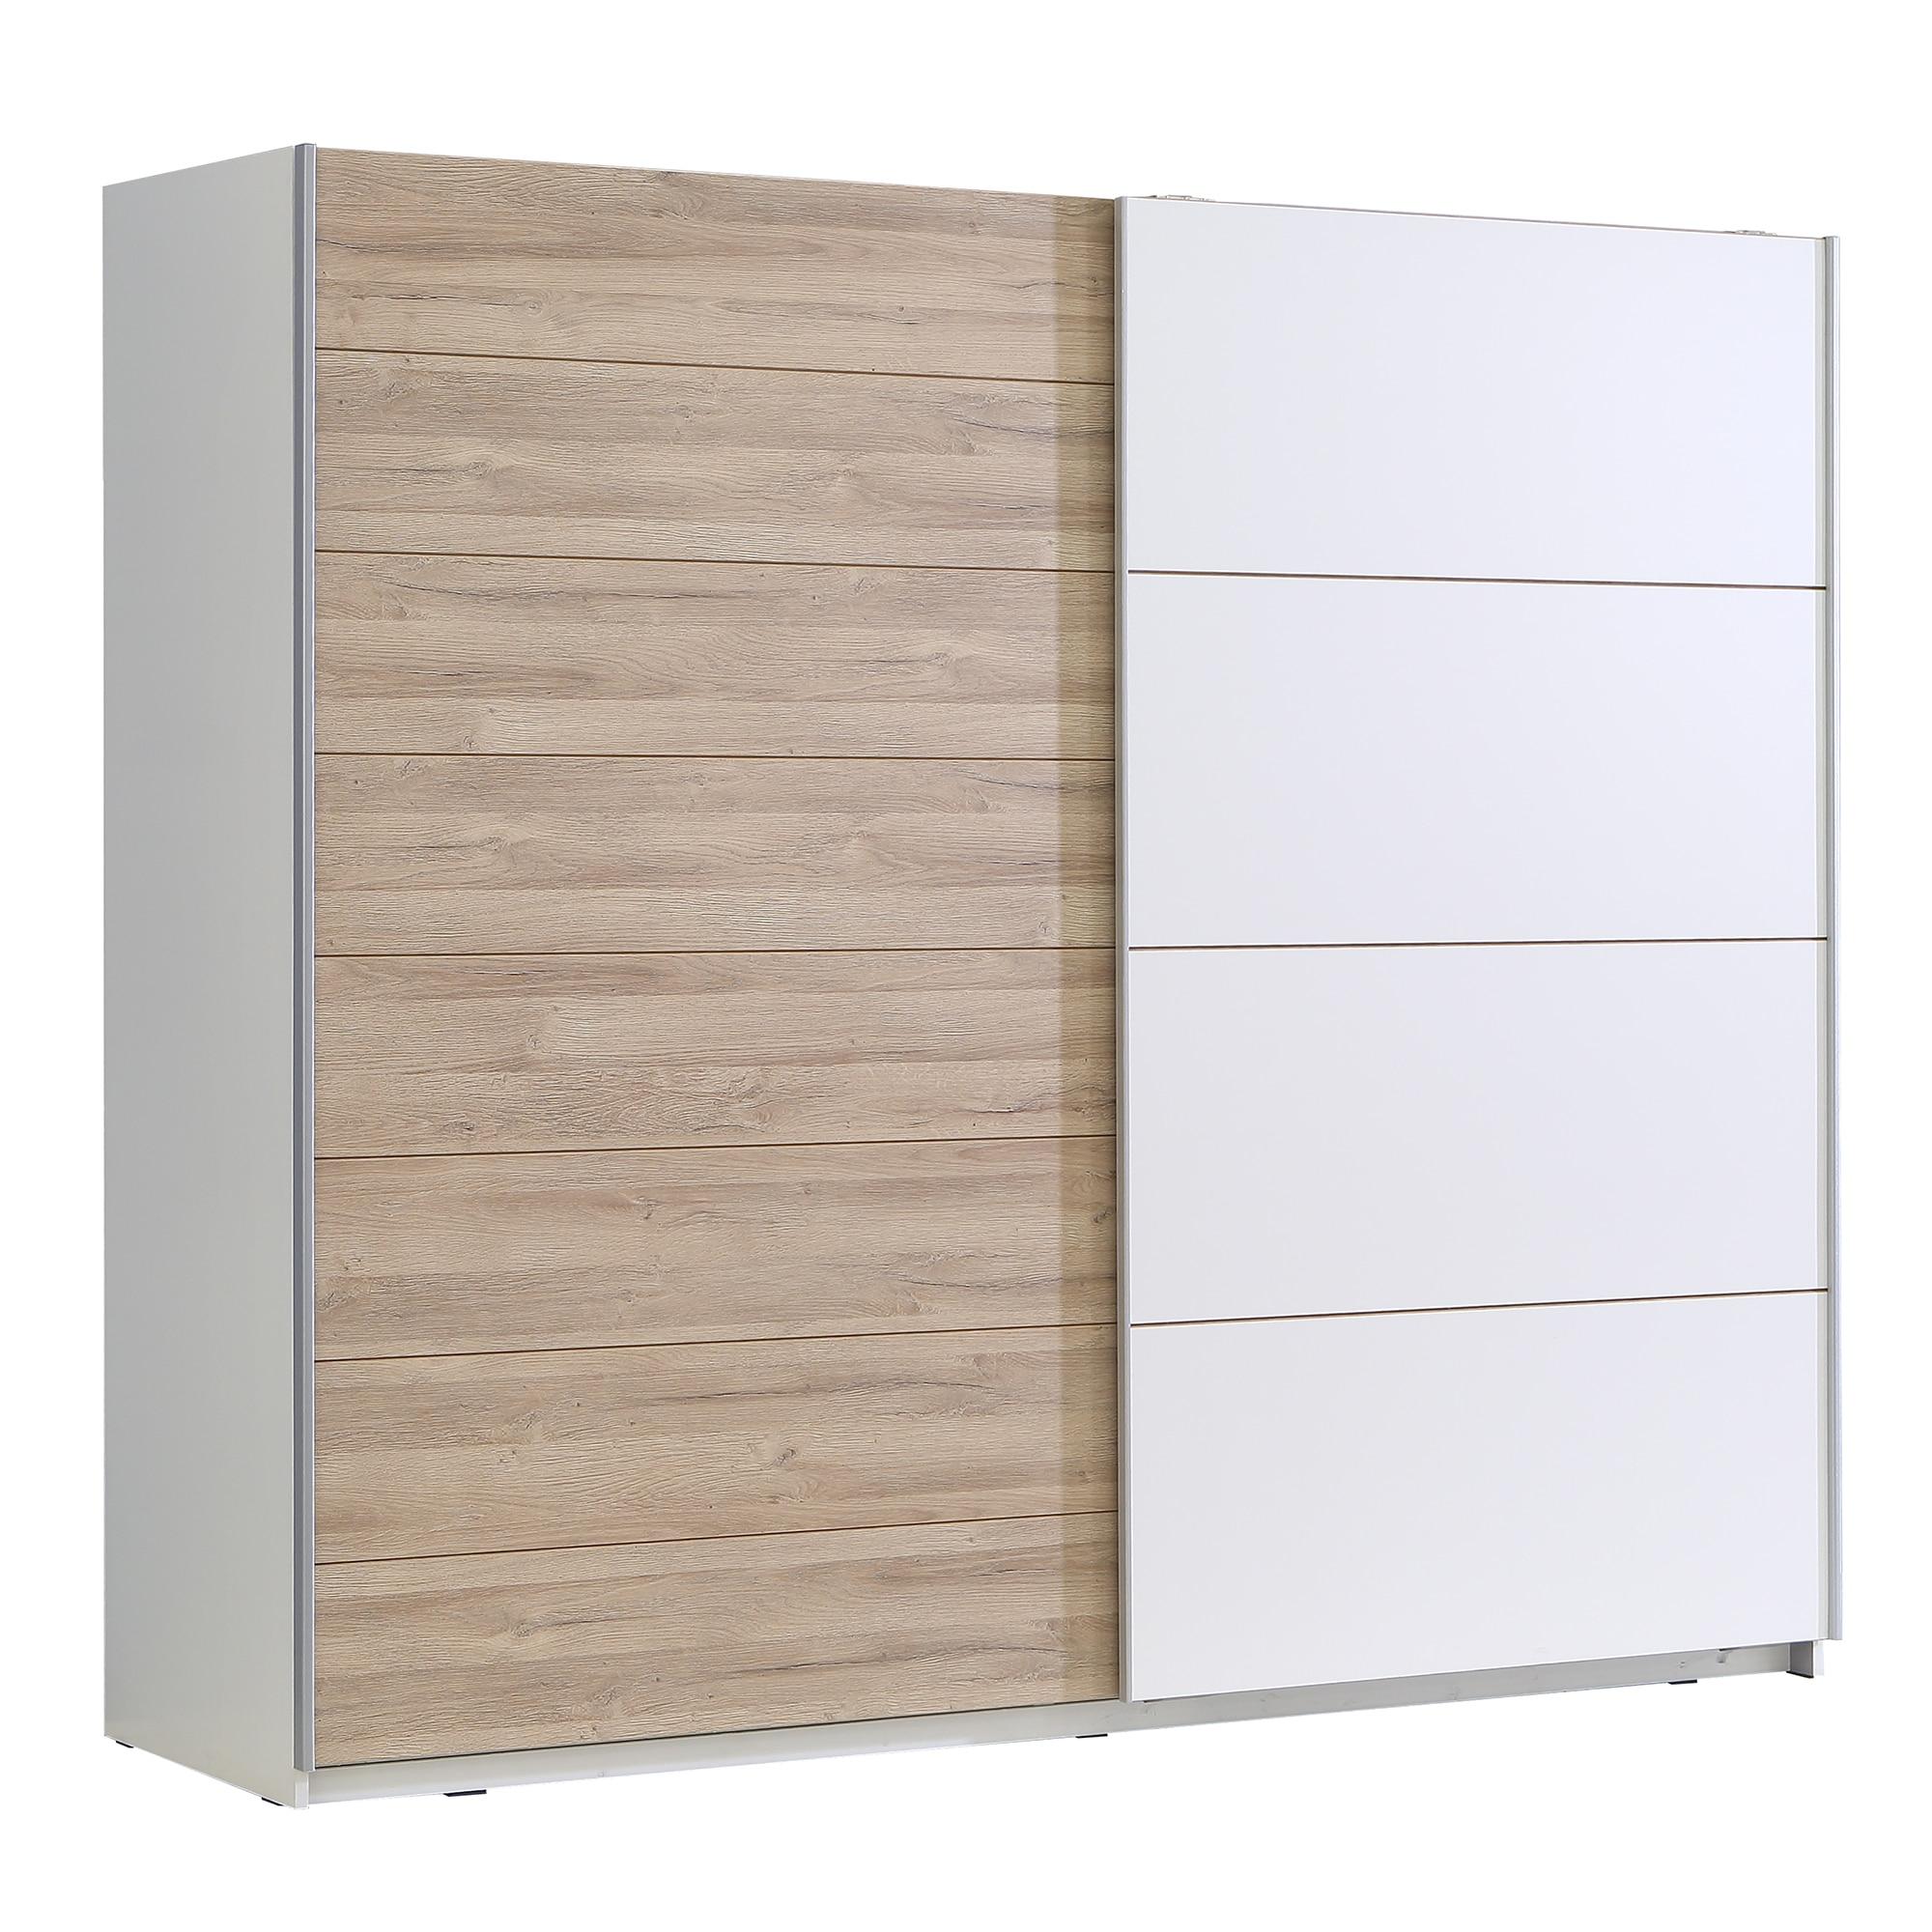 Fotografie Dulap Kring Mercur,alb/ stejar, 200x210x62 cm